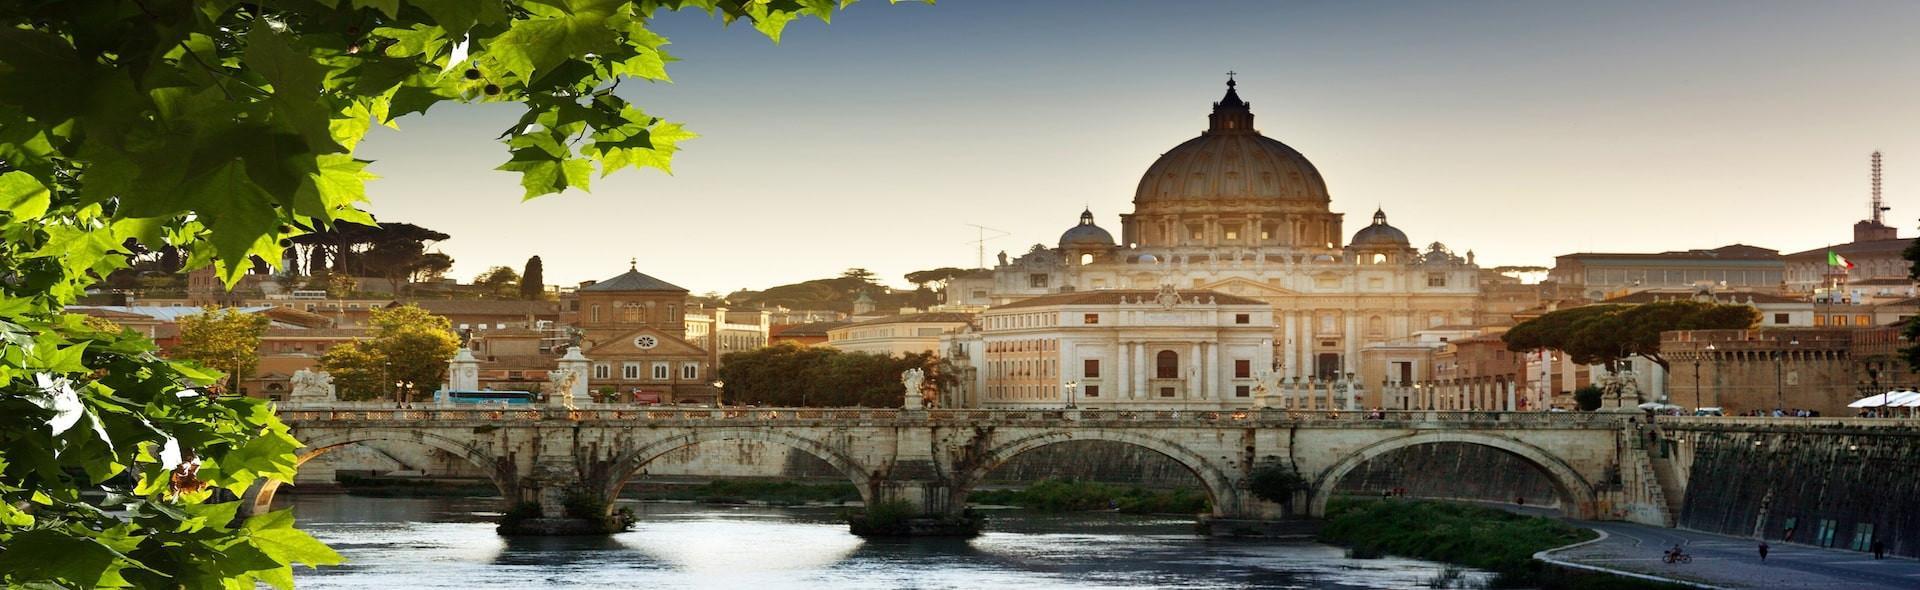 Pellegrinaggio a Roma Week End Marzo